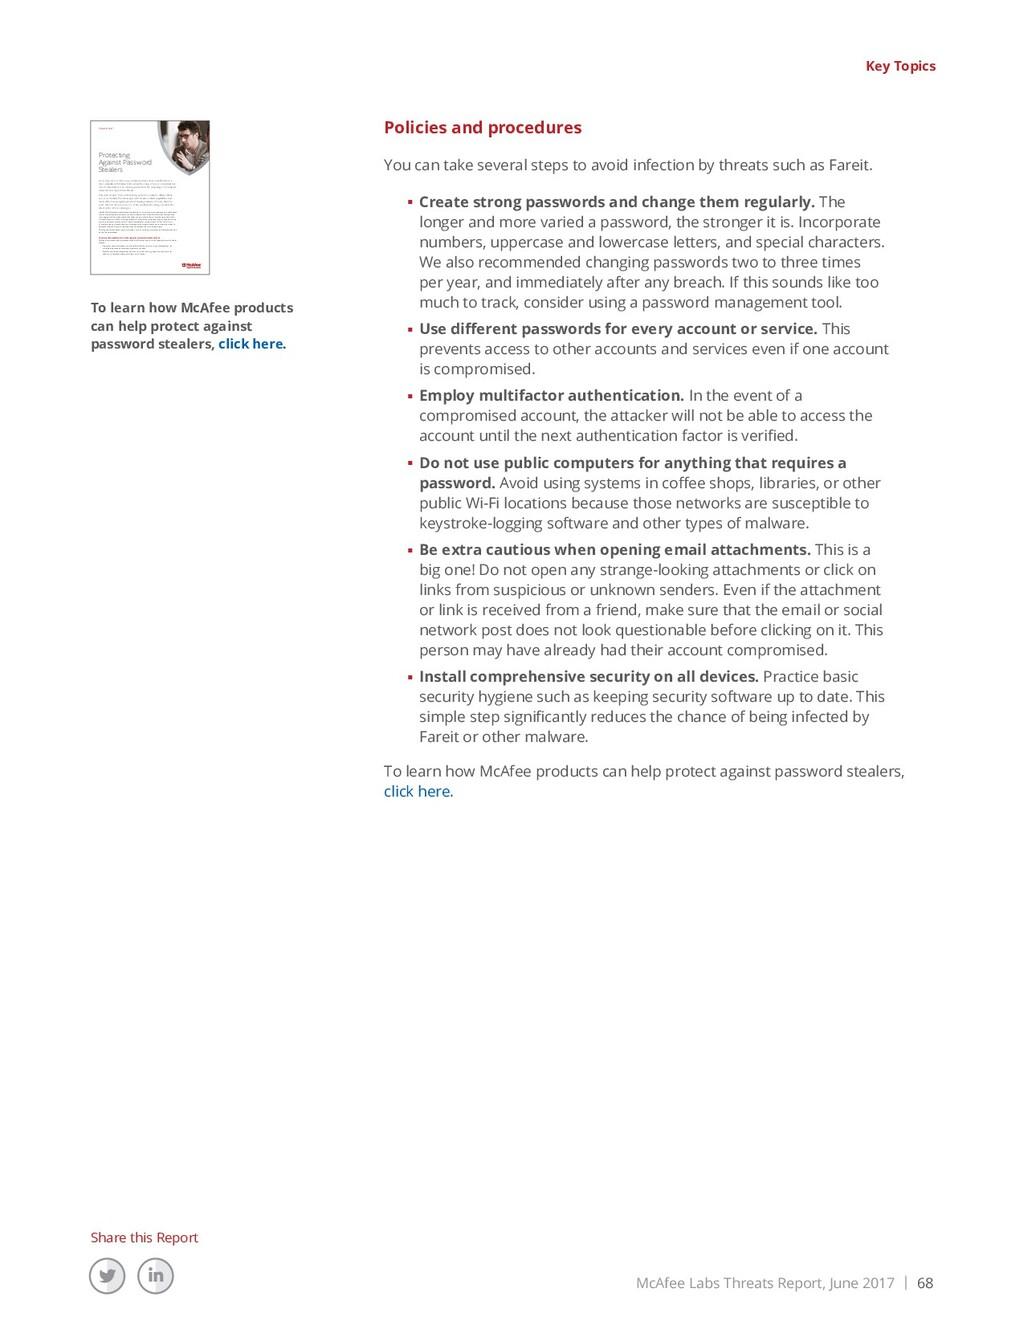 McAfee Labs Threats Report, June 2017 | 68 Shar...